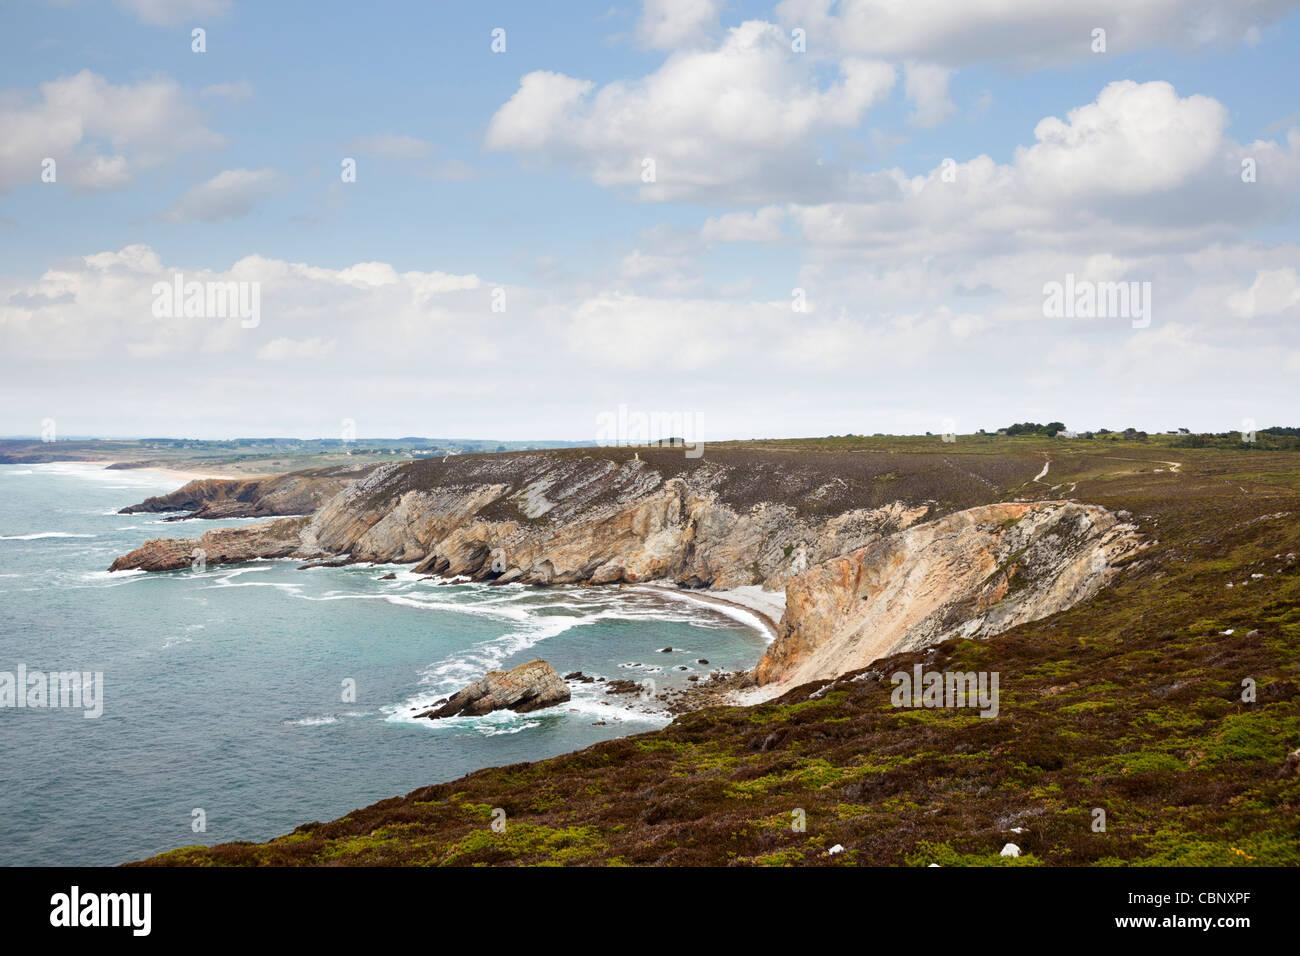 Küste bei Cap De La Chevre, Küste der Halbinsel Crozon, Bretagne, Frankreich Stockbild